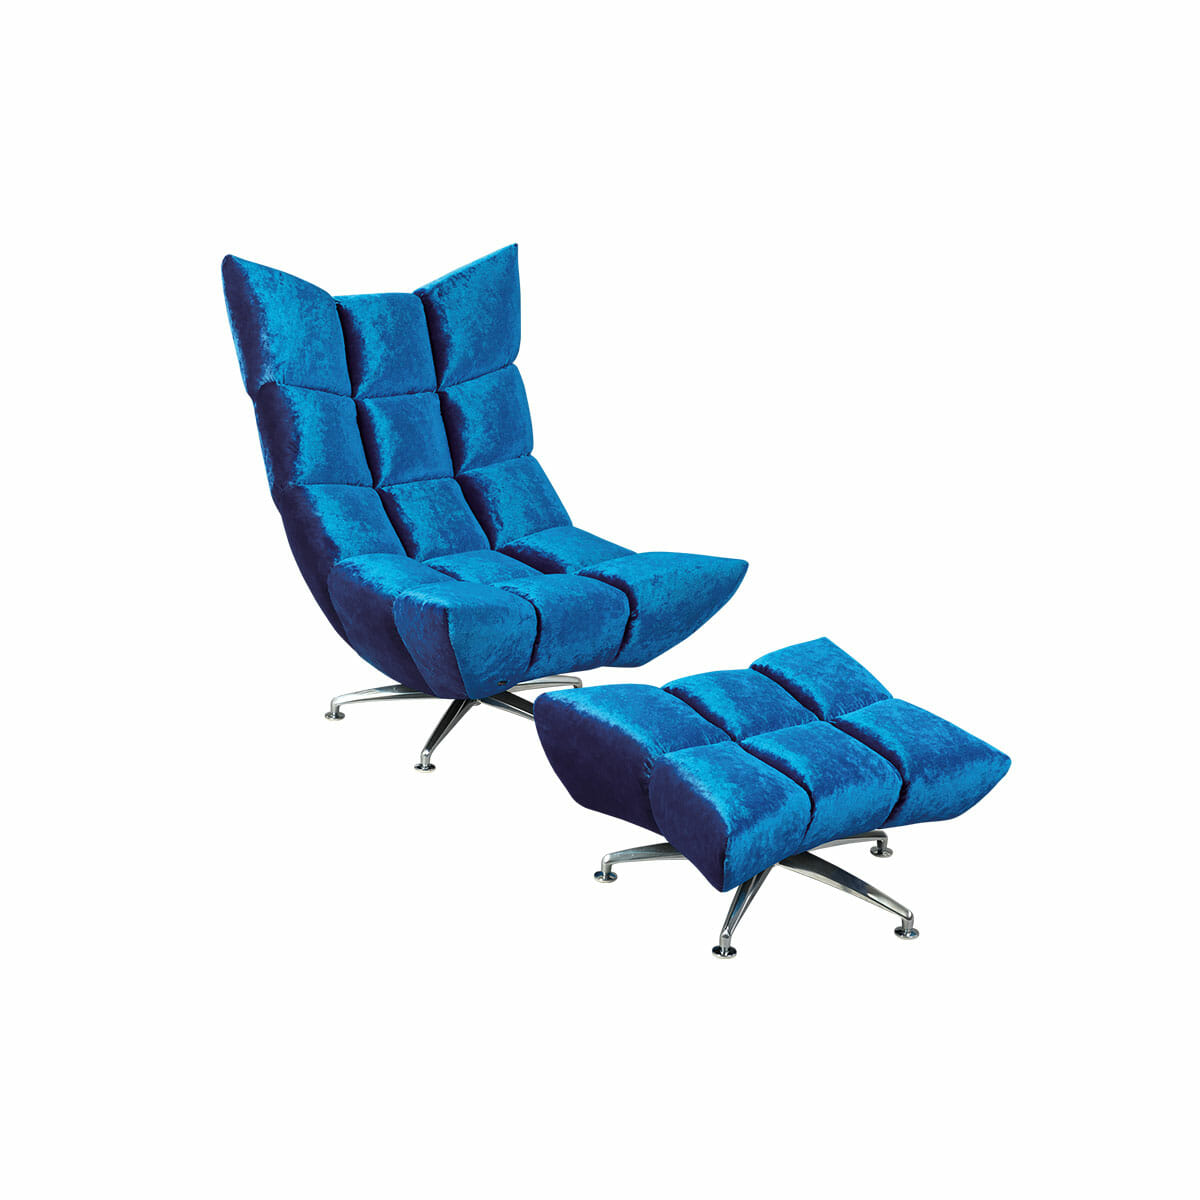 bretz hangout b122 top angebote an bretz hangout sessel. Black Bedroom Furniture Sets. Home Design Ideas